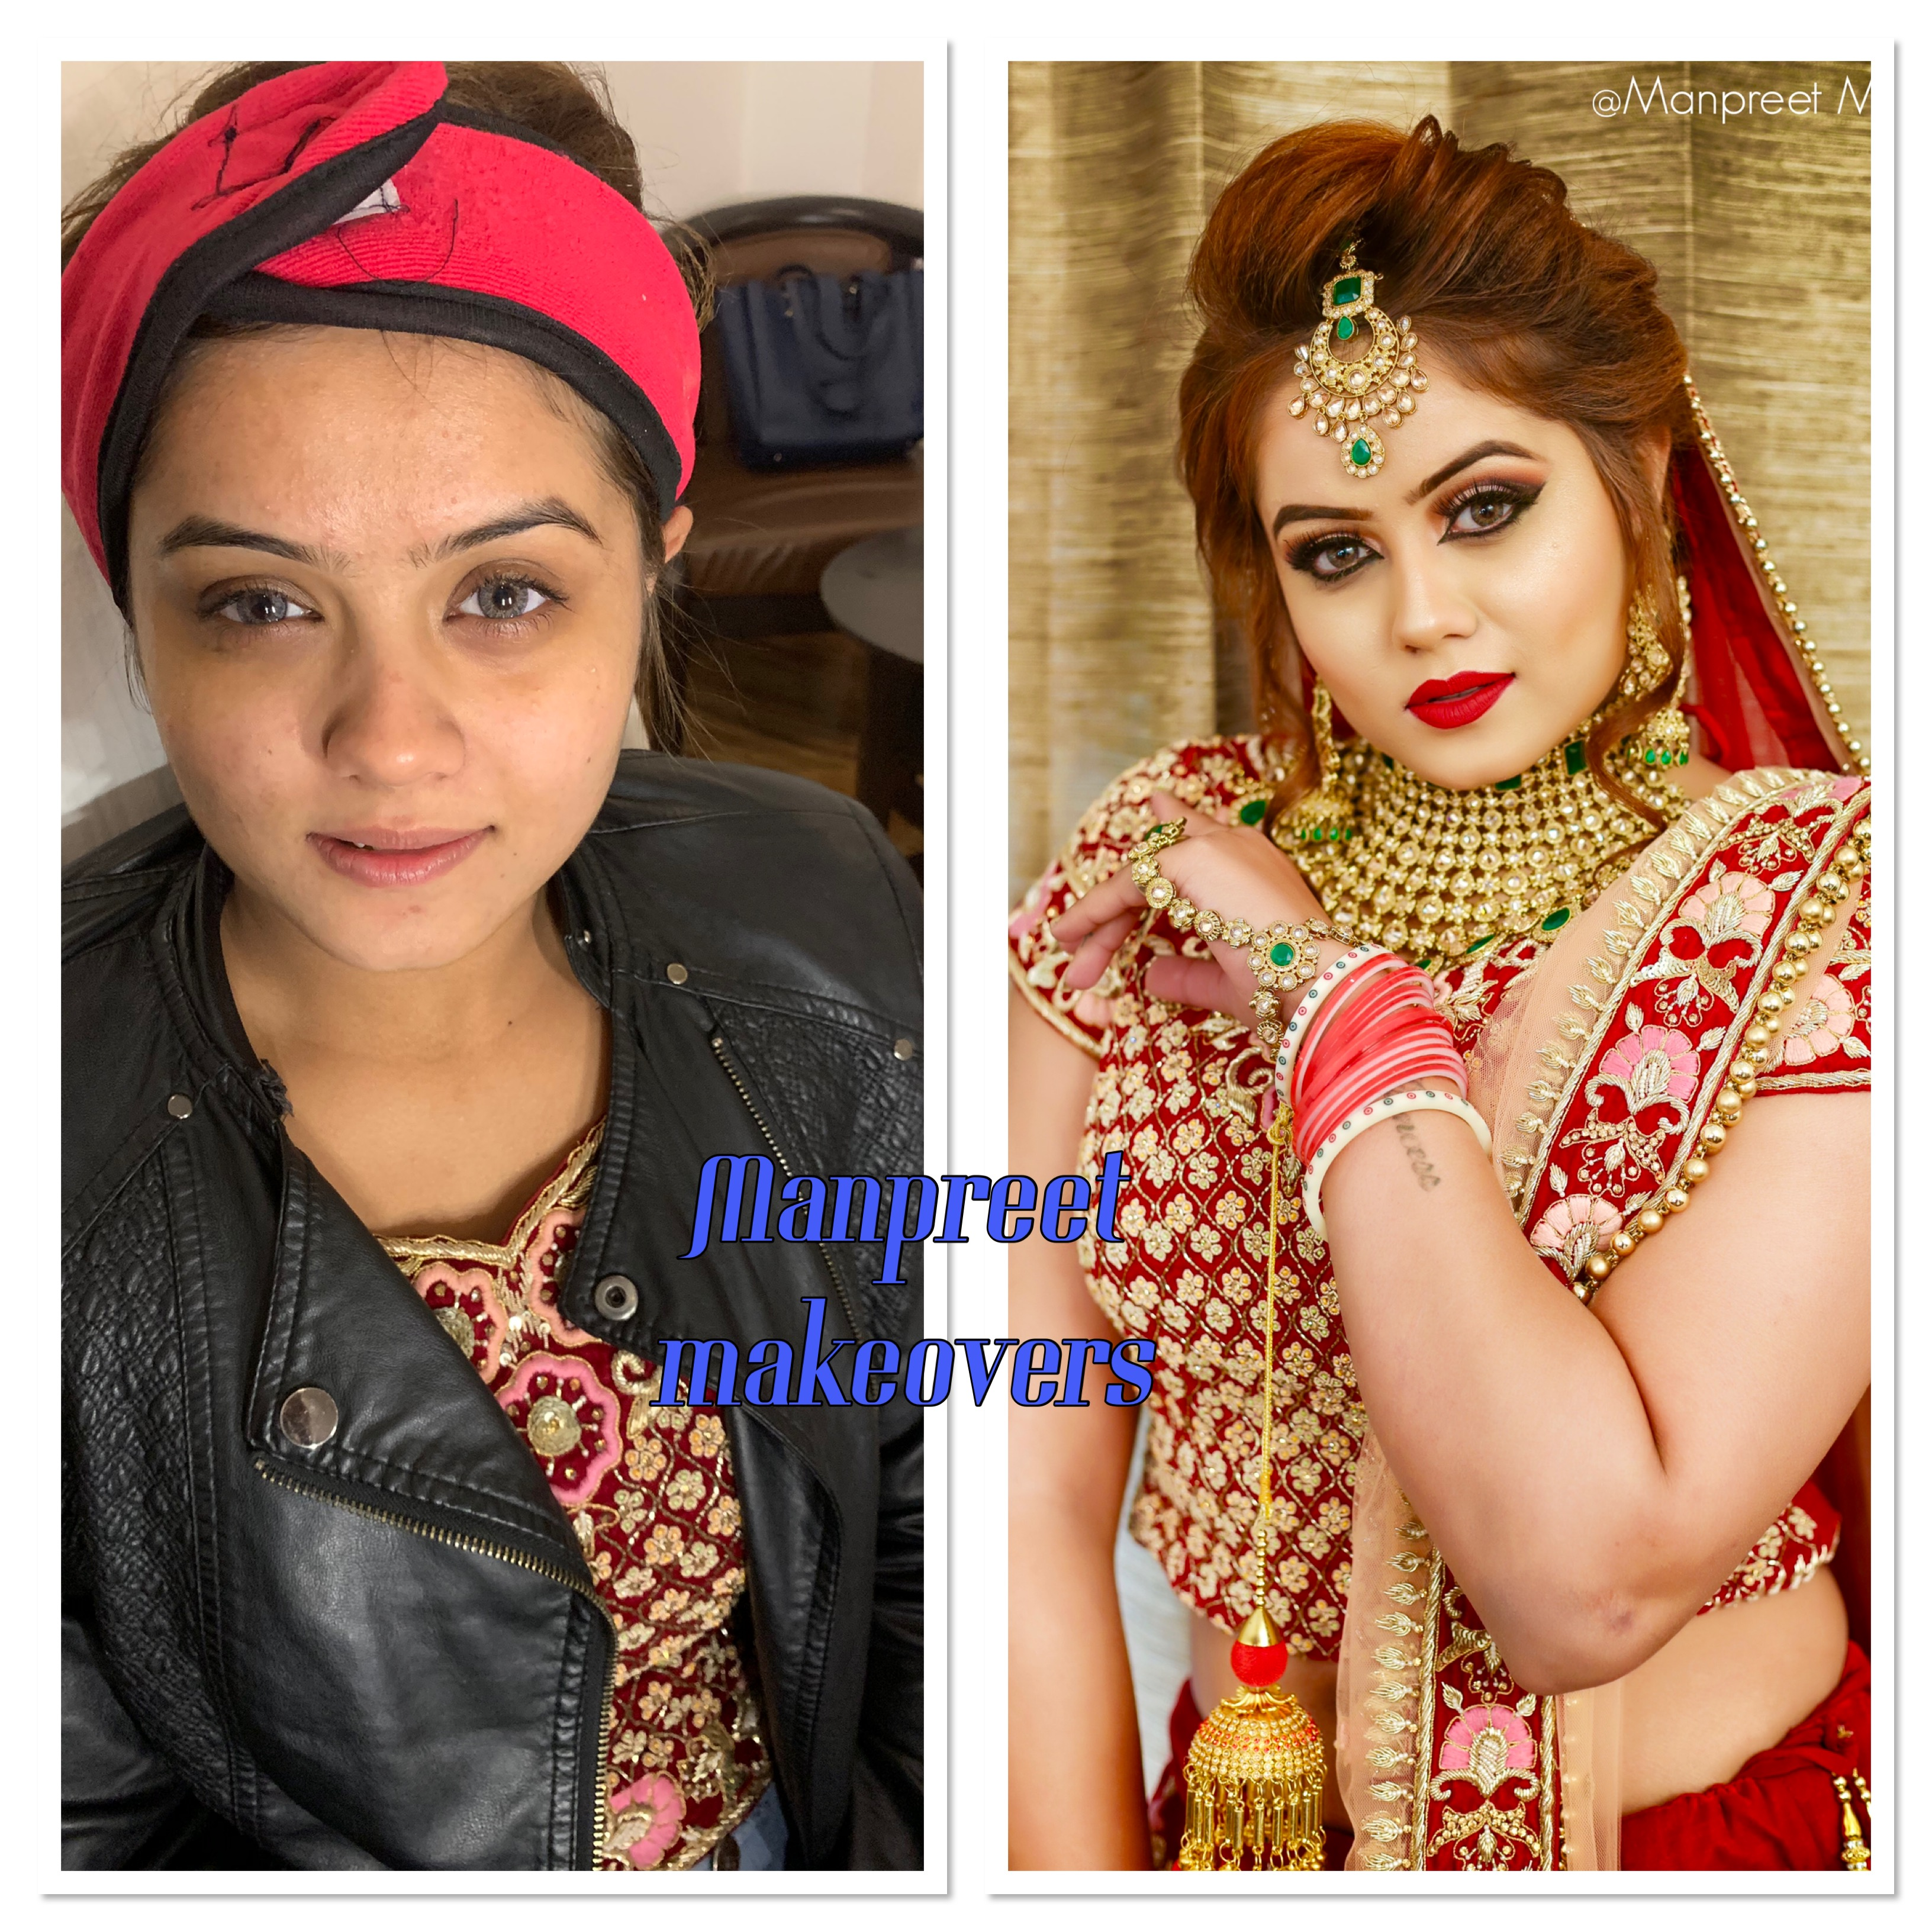 manpreet-kaur-makeup-artist-jalandhar